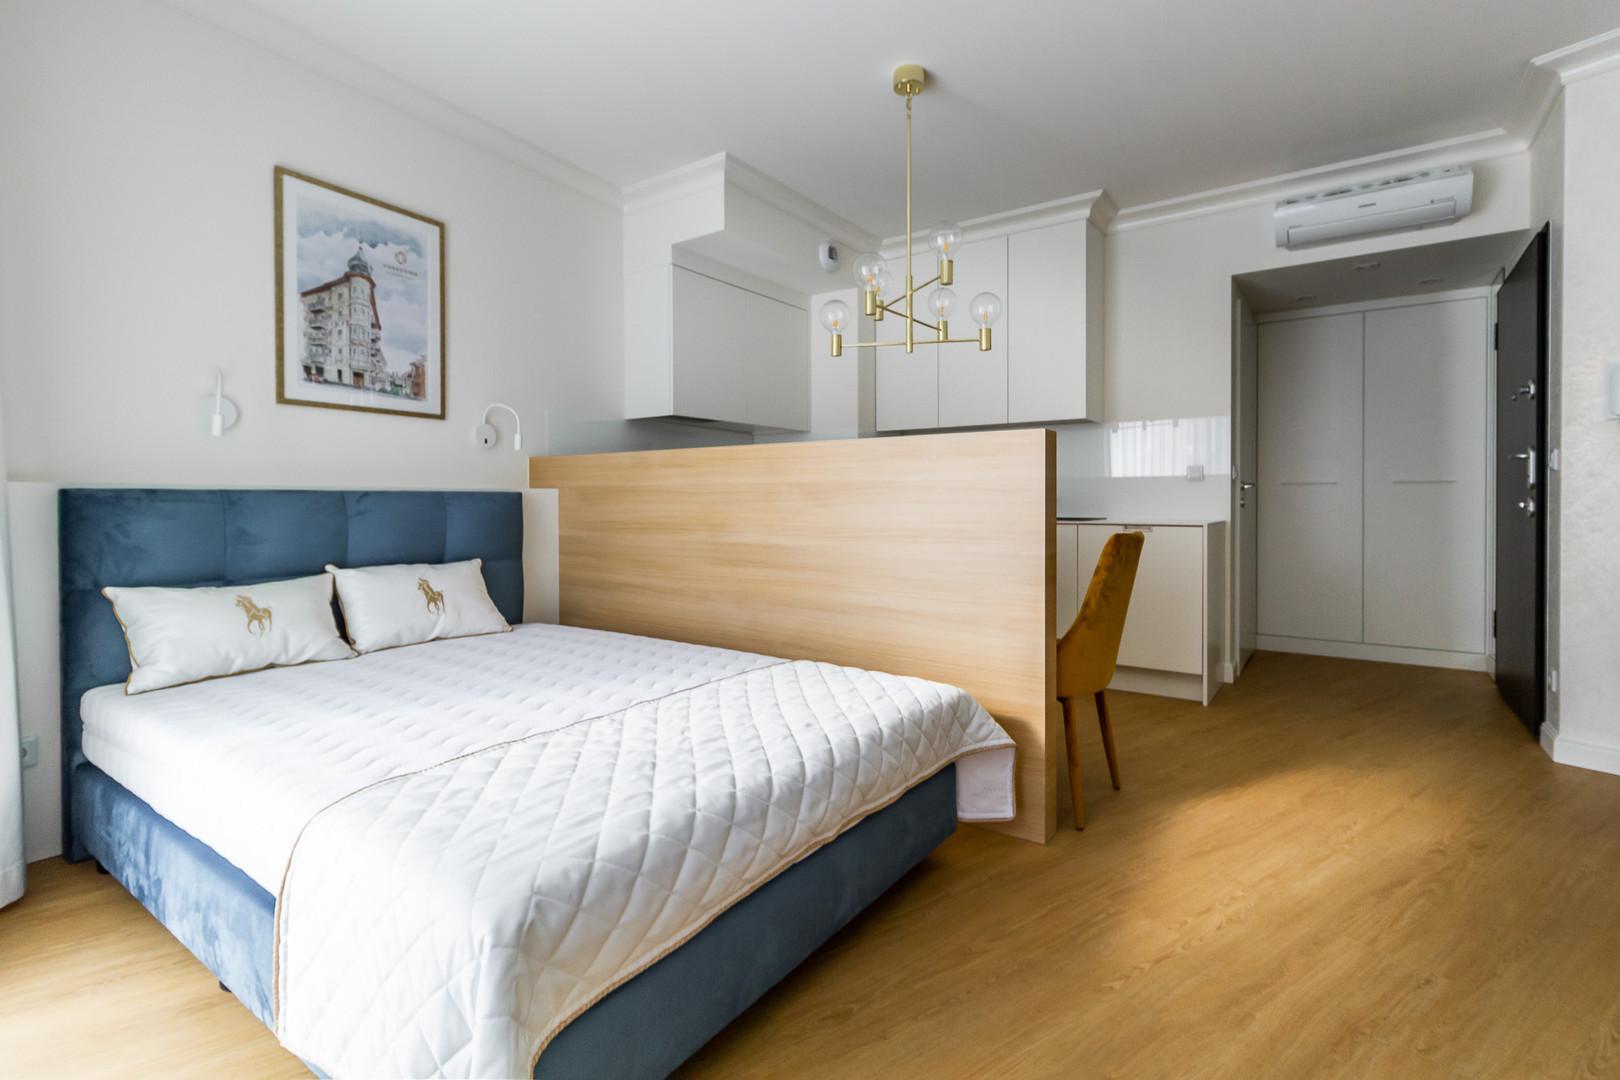 Property to rent Poznan Poland-2.jpg